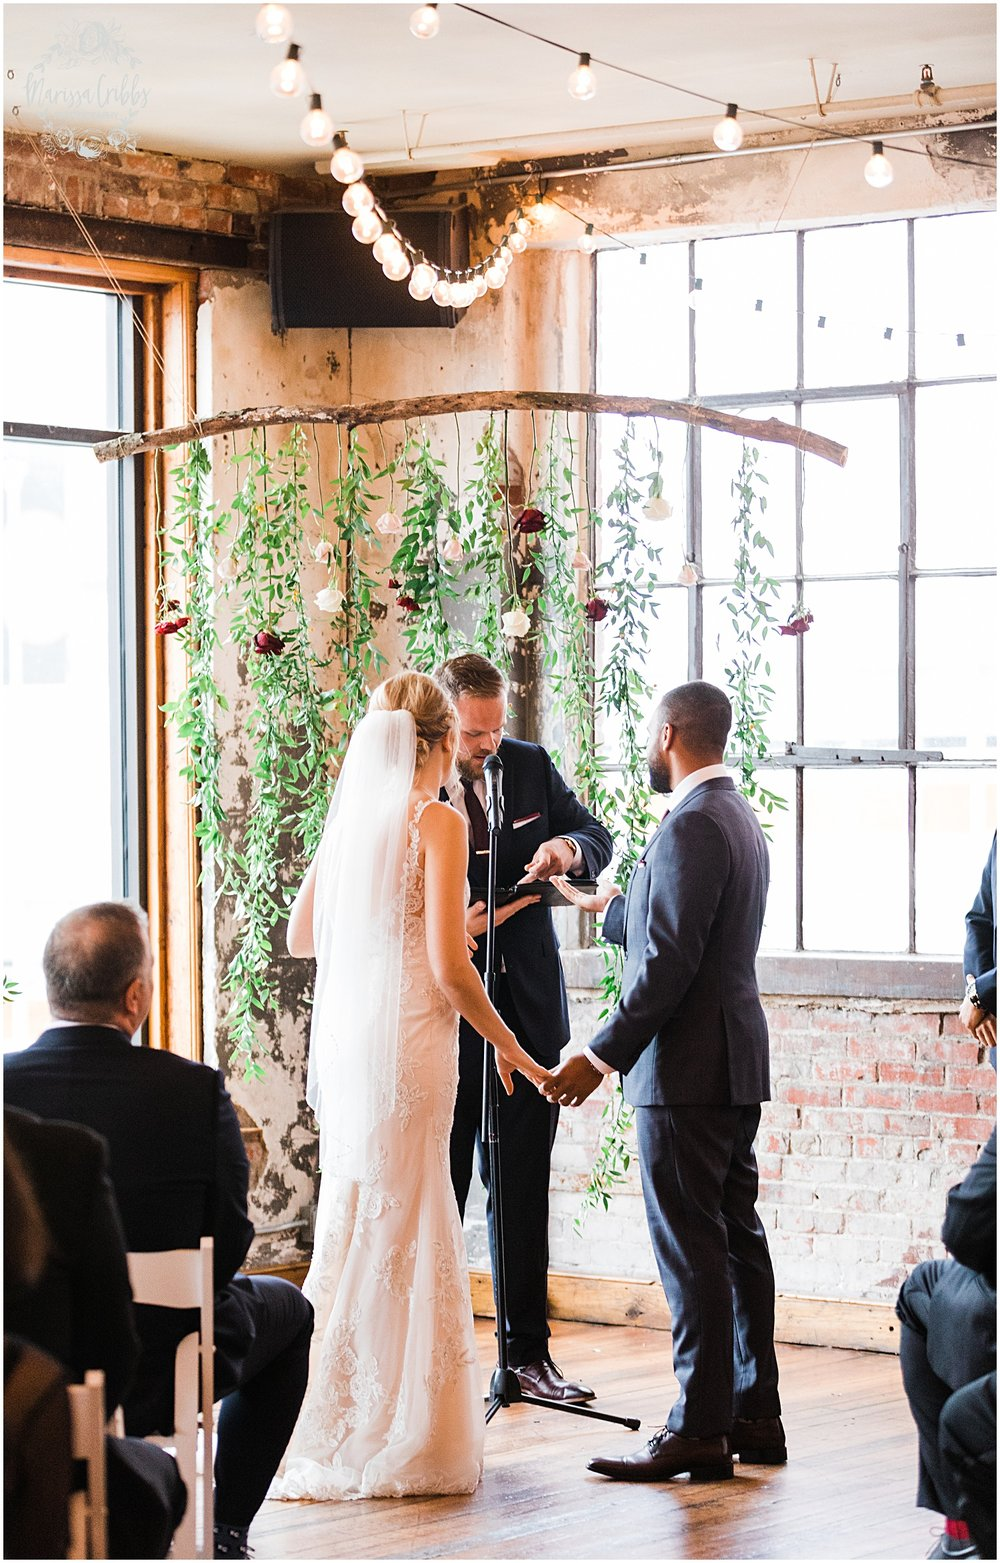 BAUER WEDDING | KELSEA & JUSTIN | MARISSA CRIBBS PHOTOGRAPHY_6557.jpg